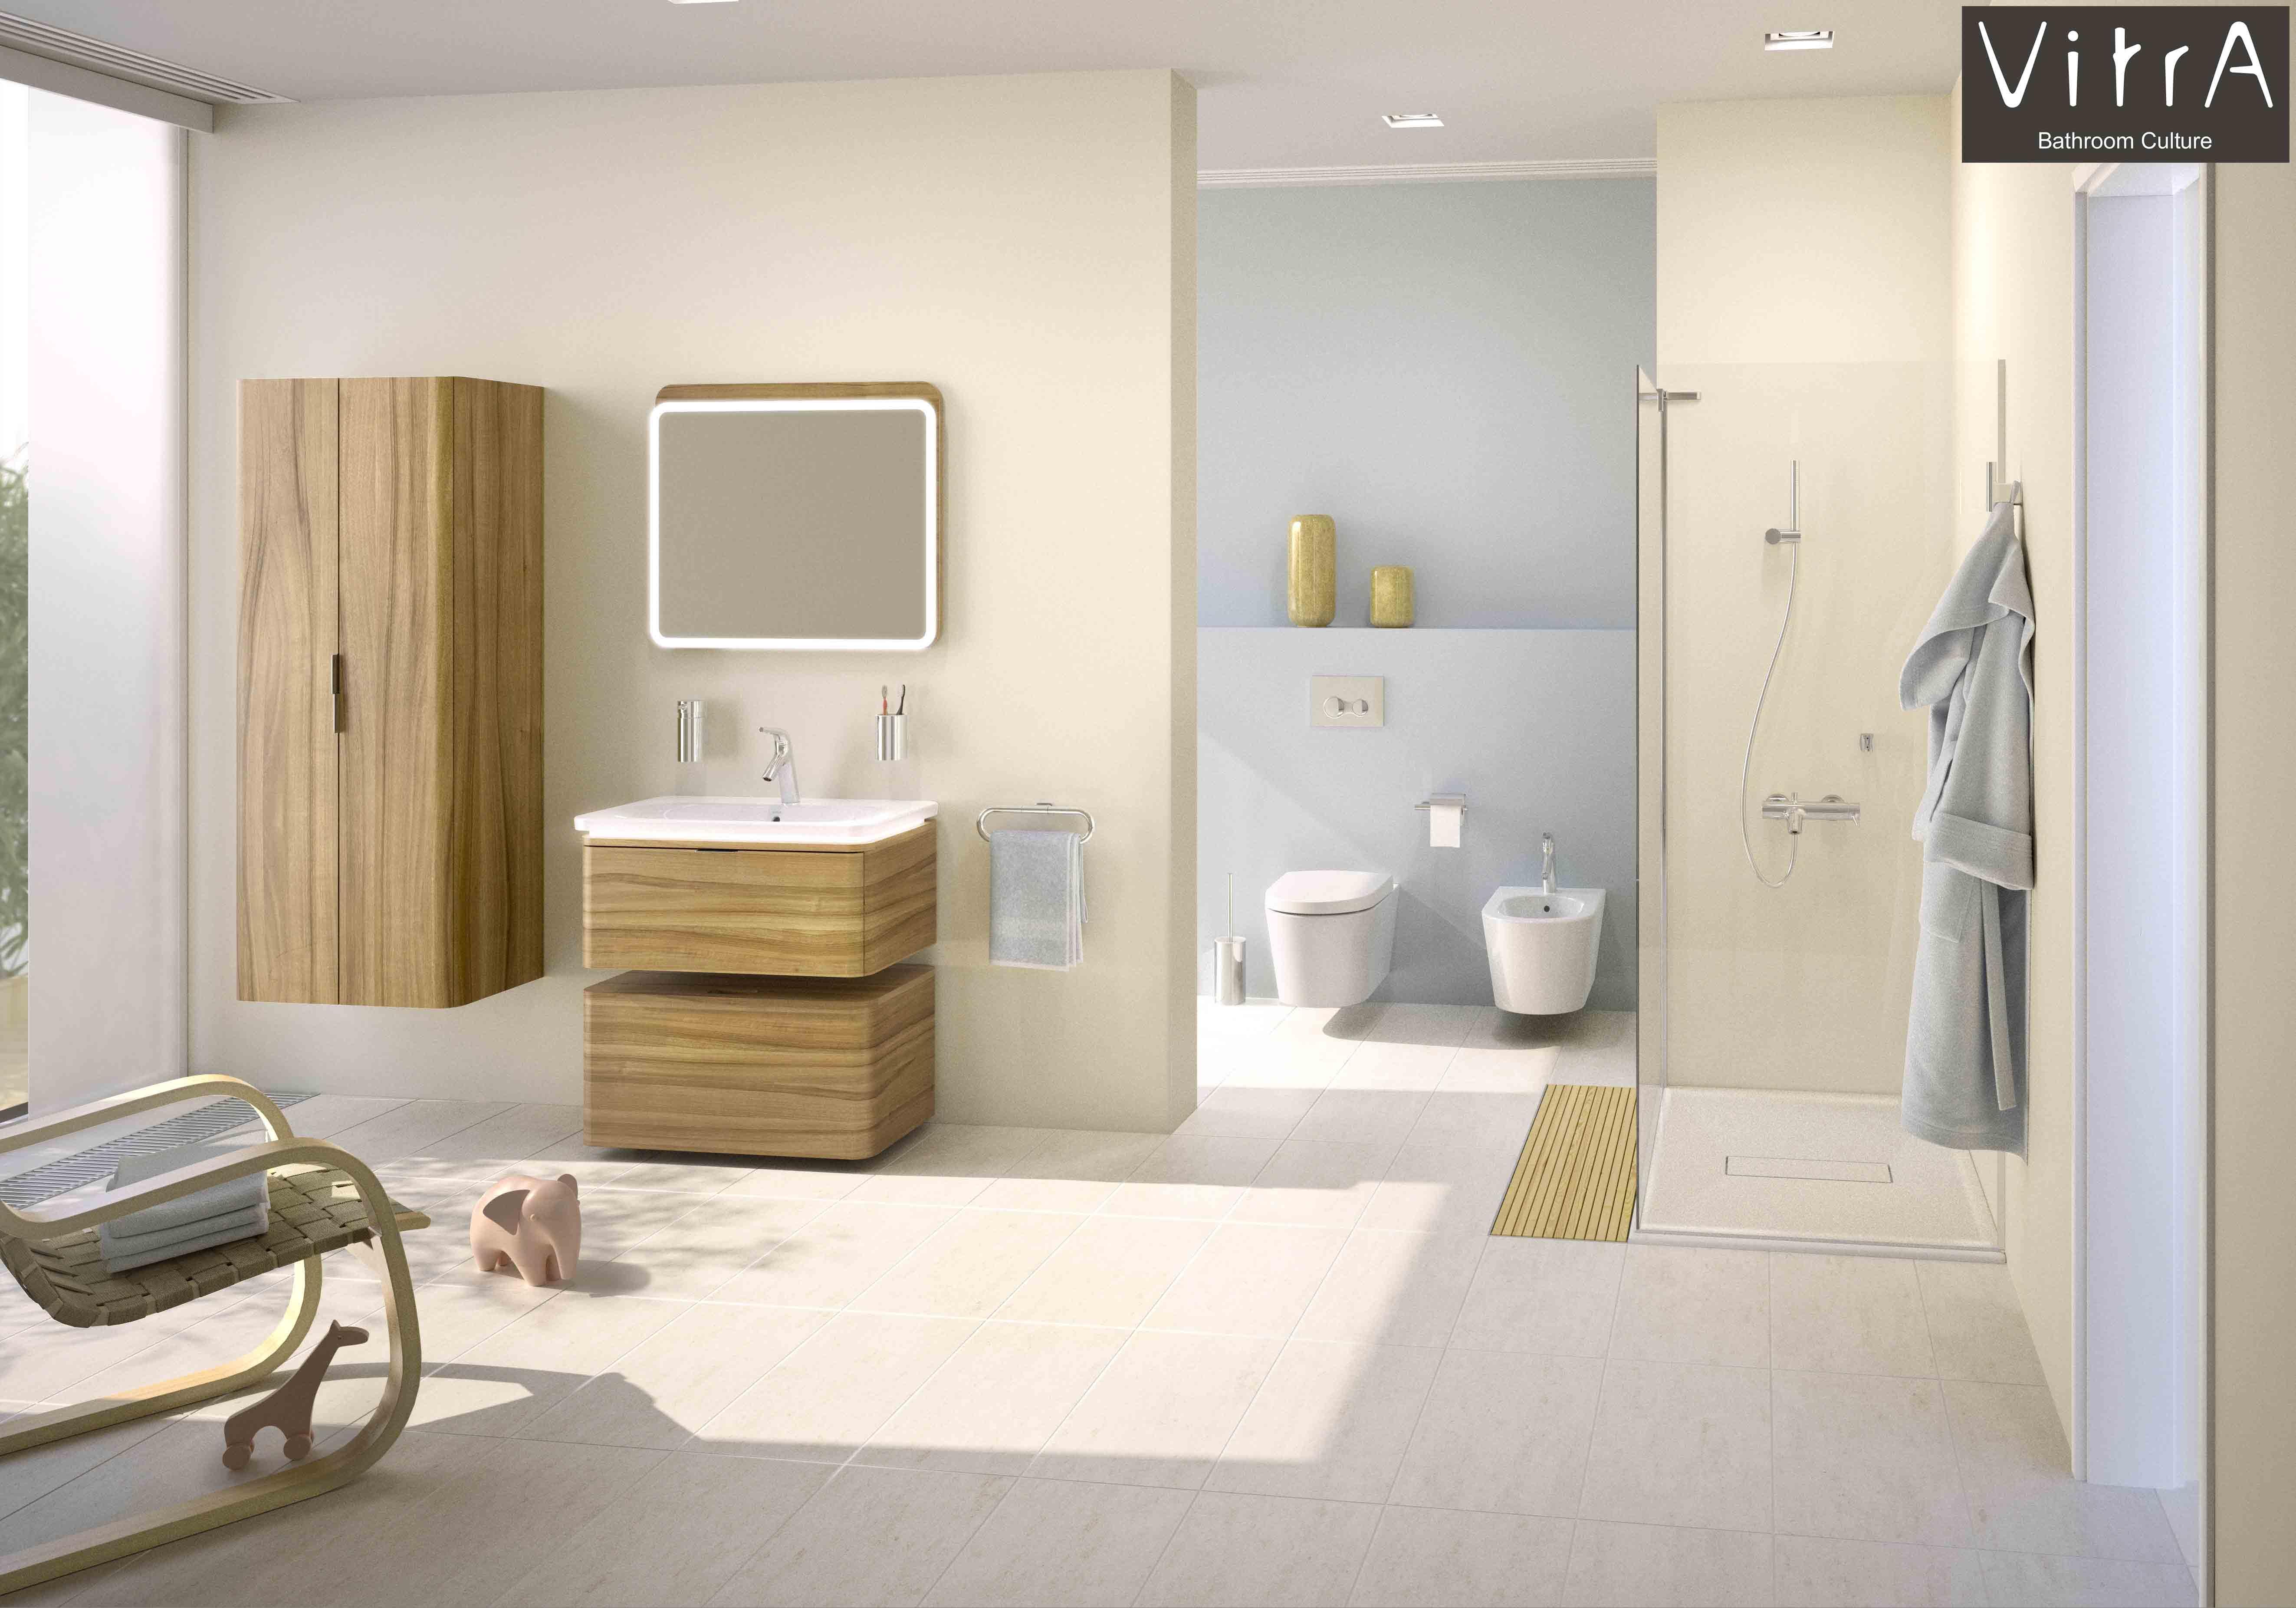 vitra introduces its nest trendy series bathroom ideas designed